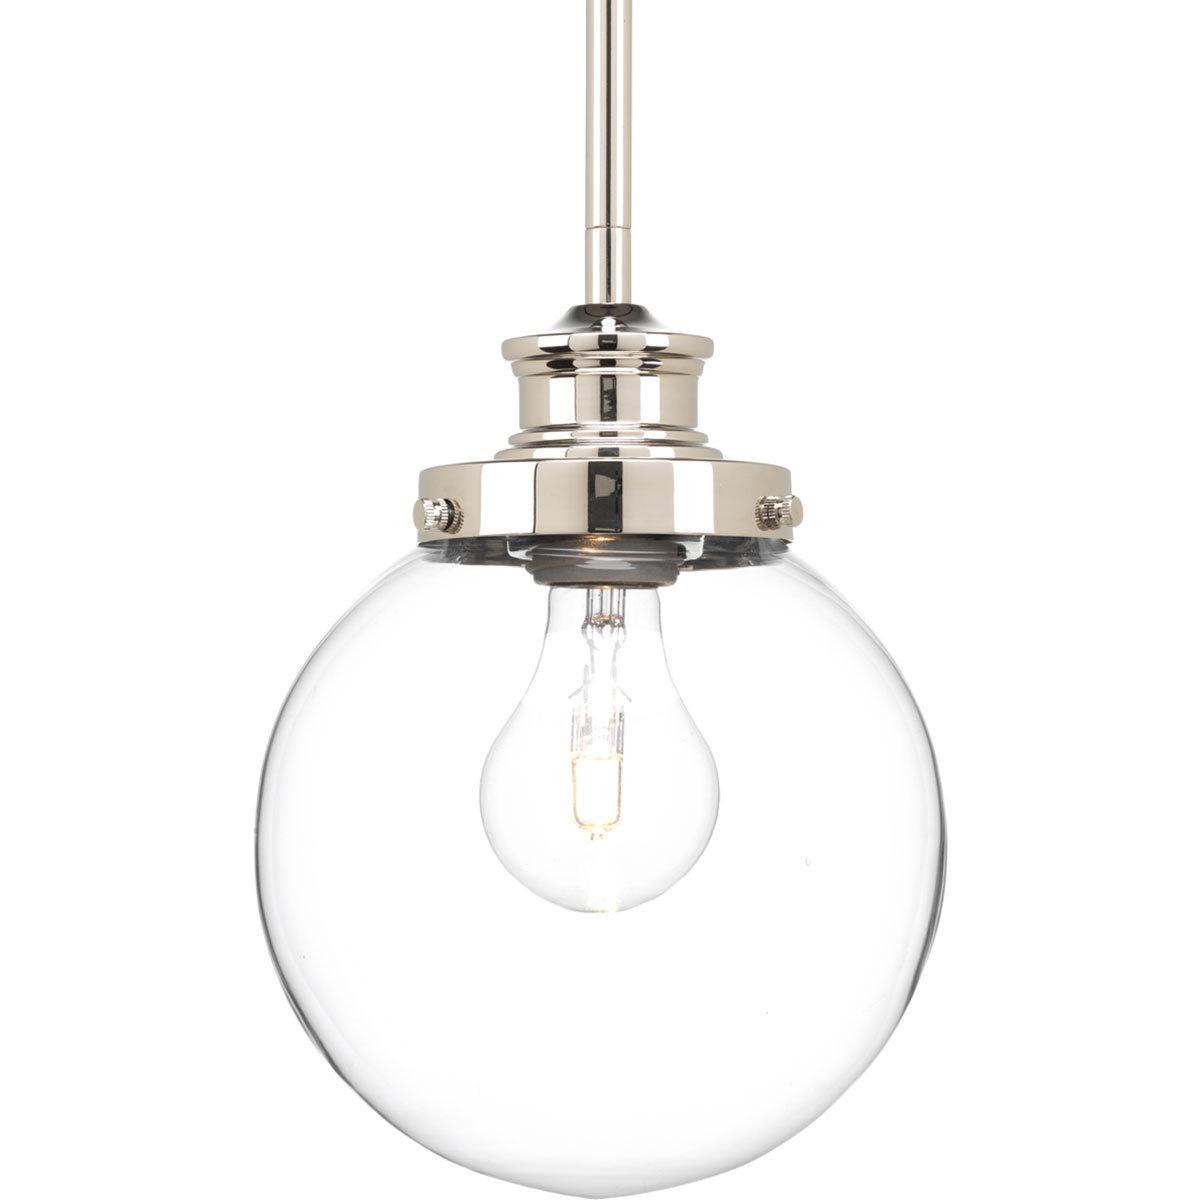 Cayden 1 Light Single Globe Pendant Within Prange 1 Light Single Globe Pendants (View 16 of 30)